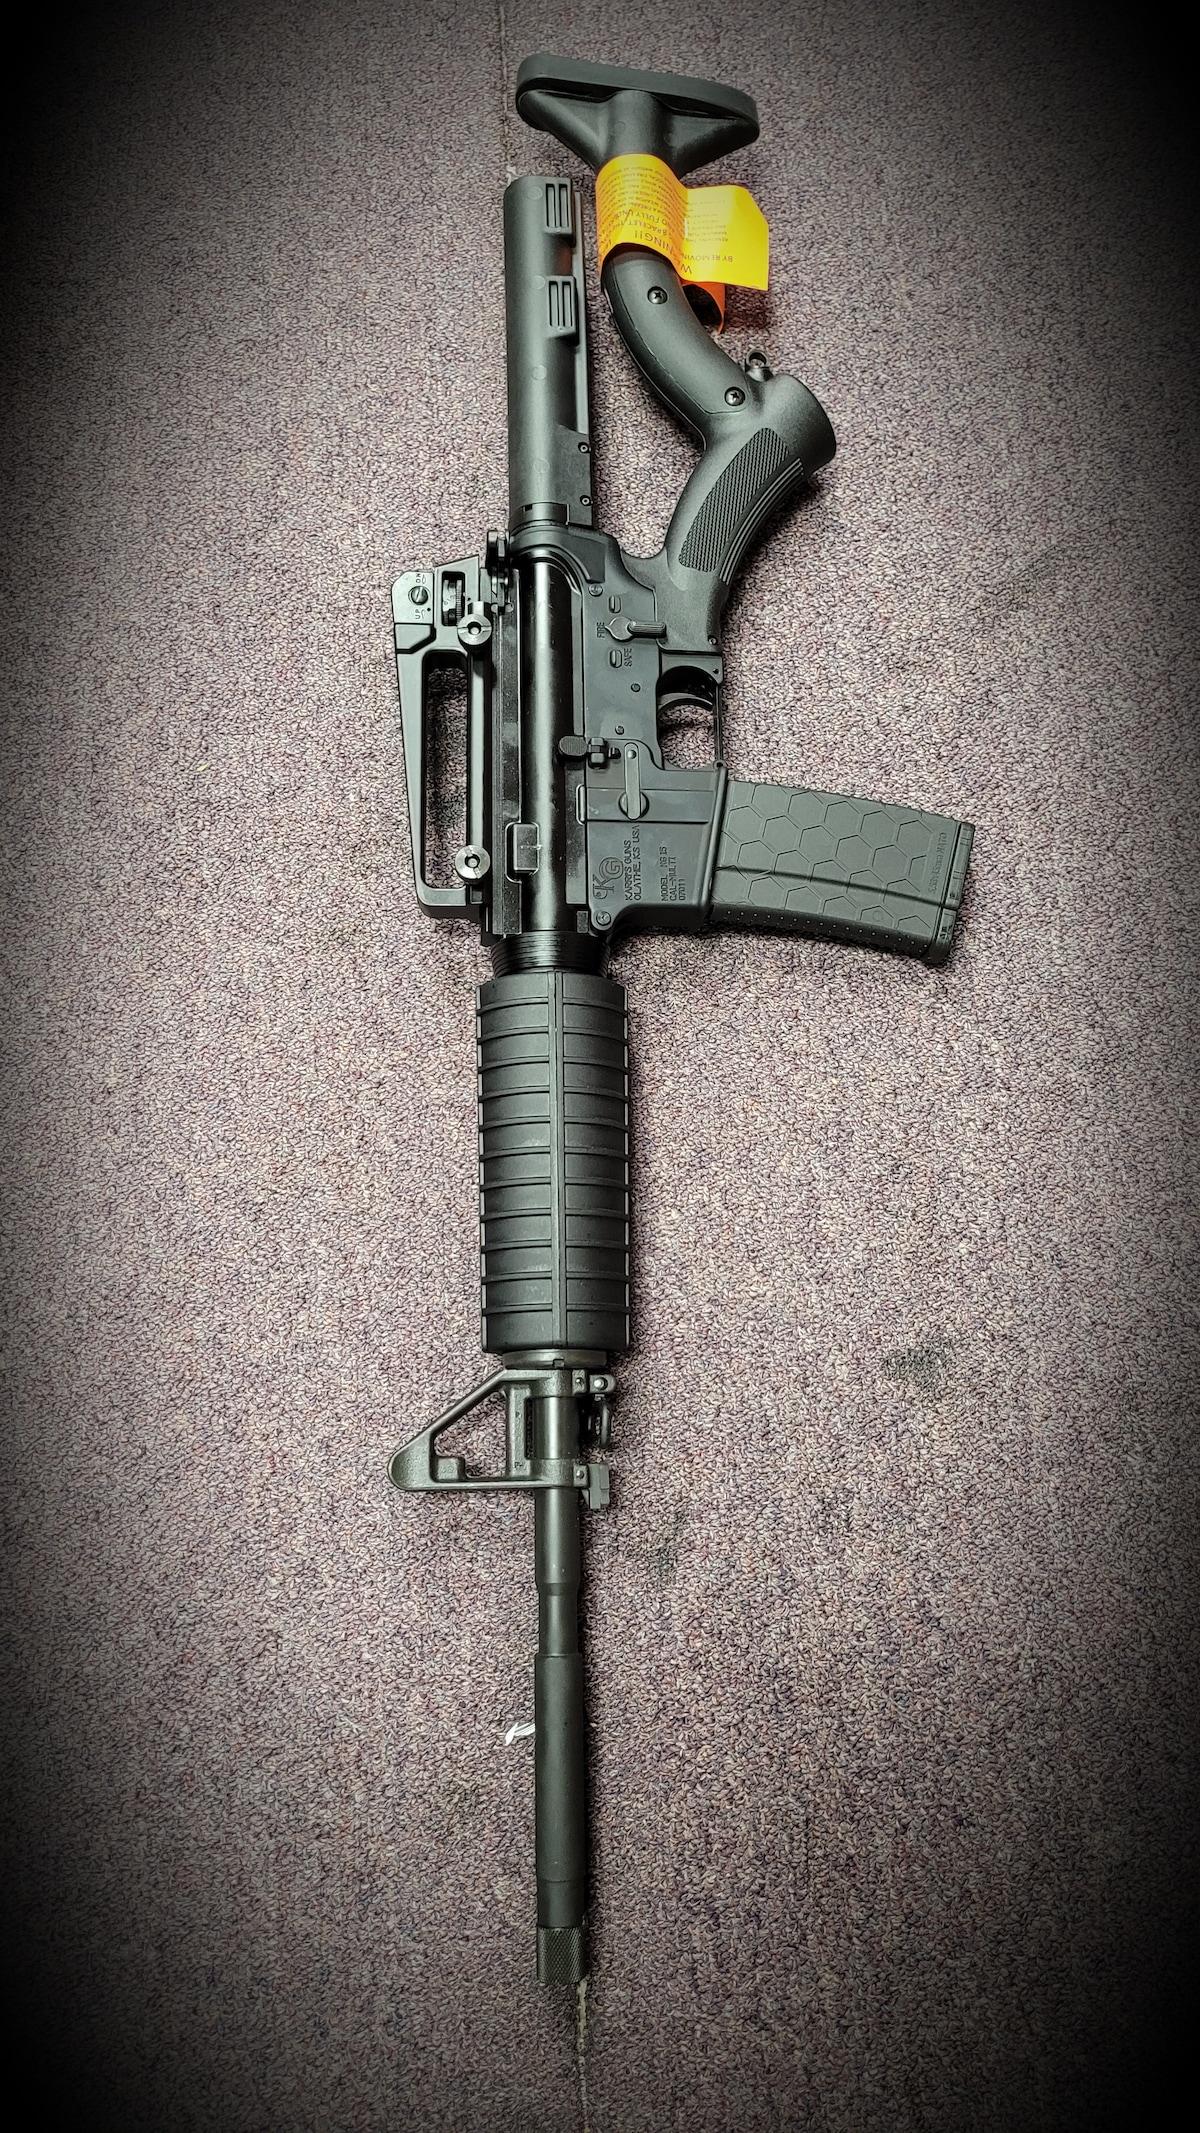 KARRI'S GUNS Featureless KG-15 AR AR-15 M4 M16